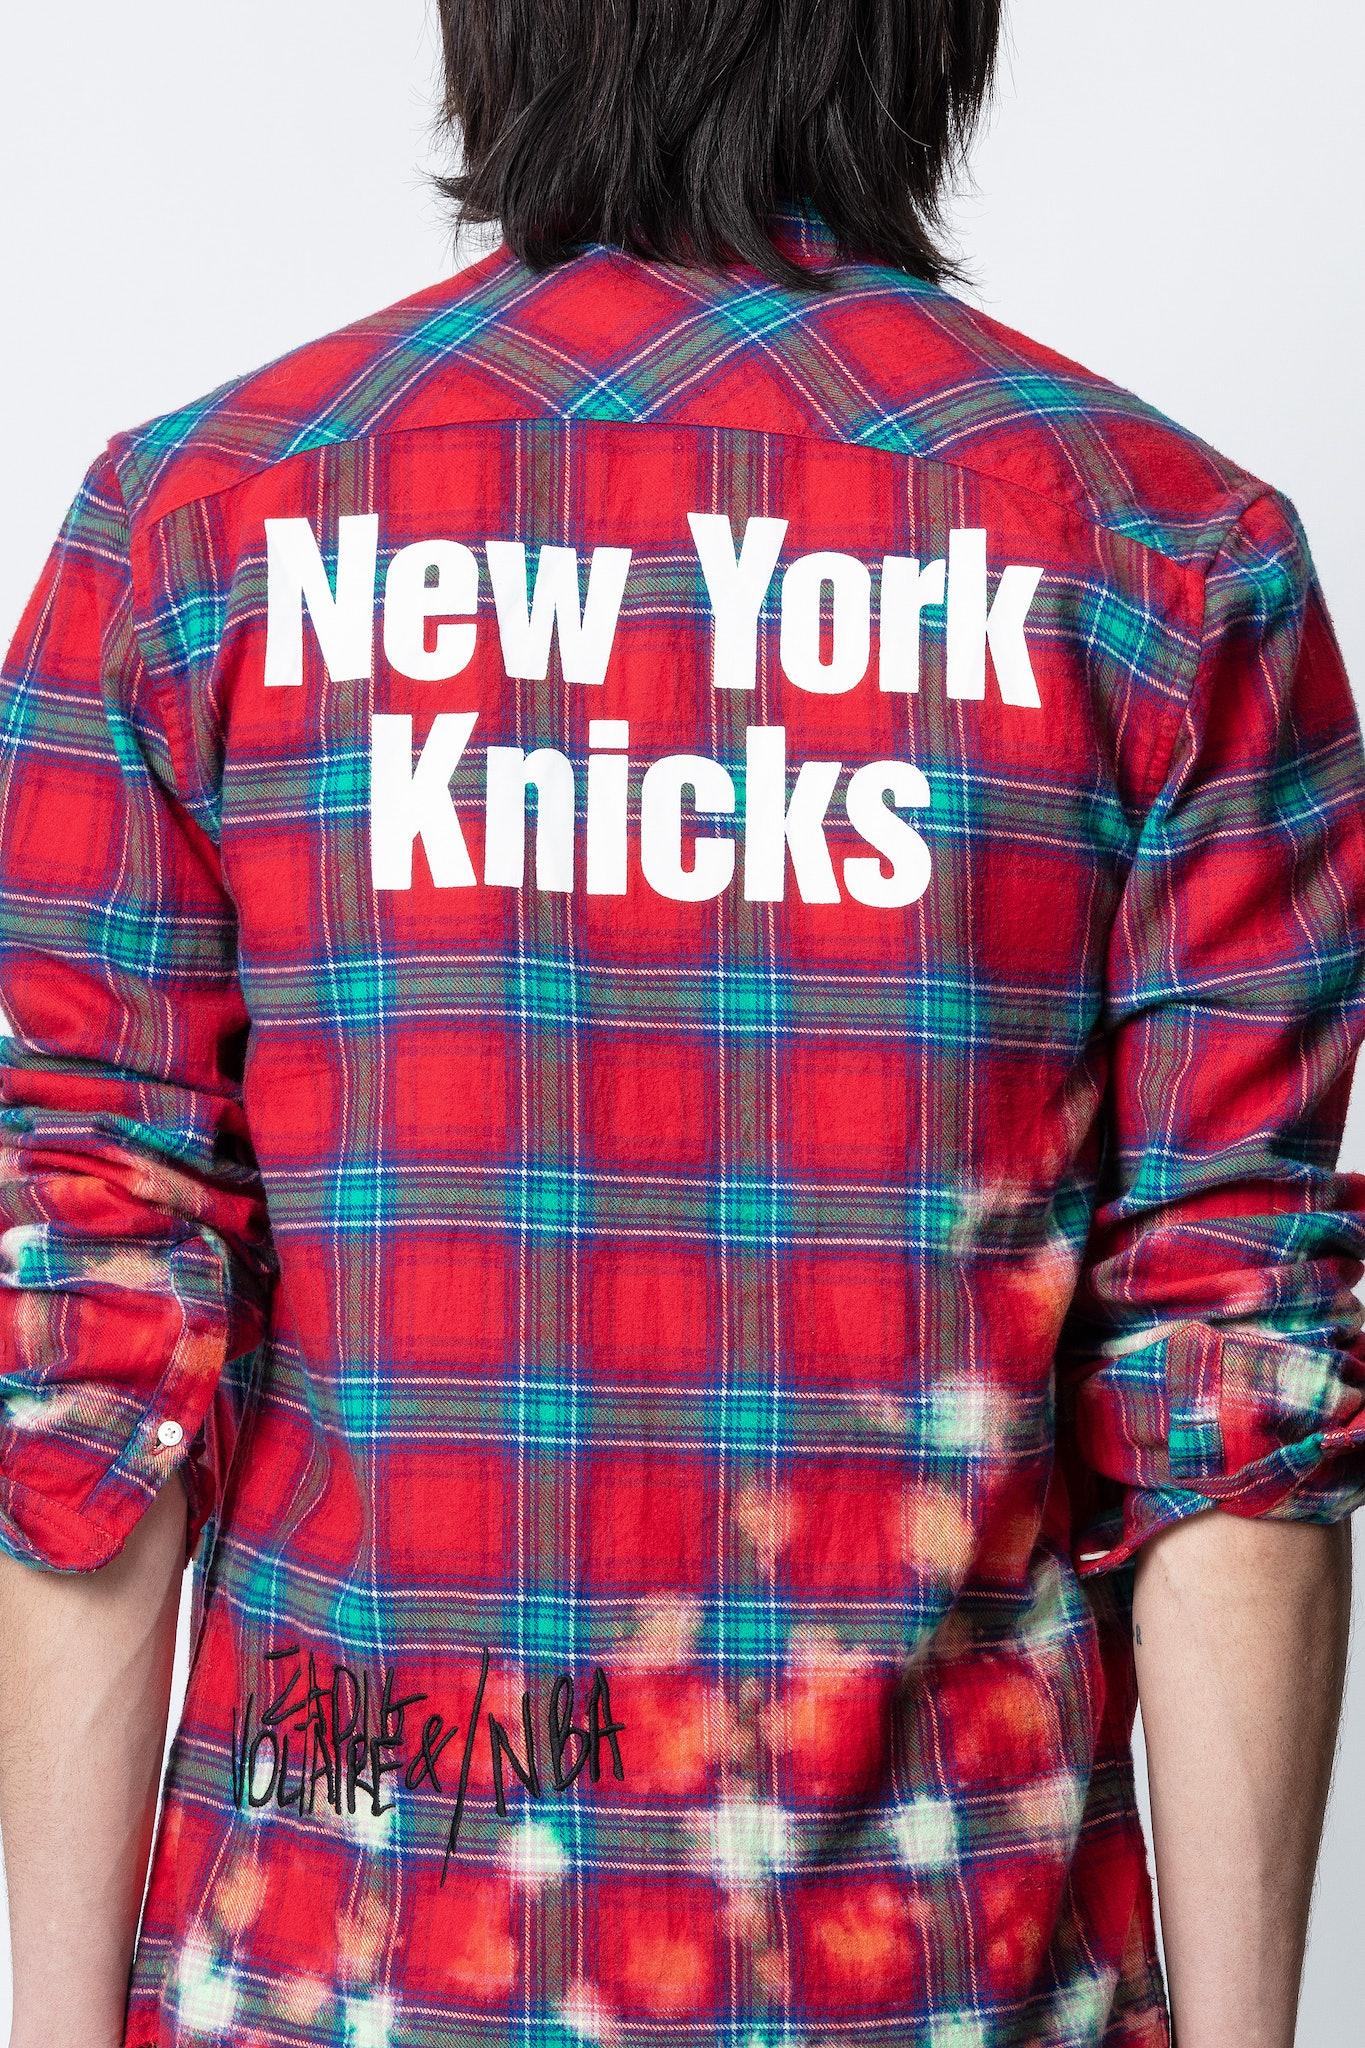 Torrol Knicks Plaid Shirt NBA